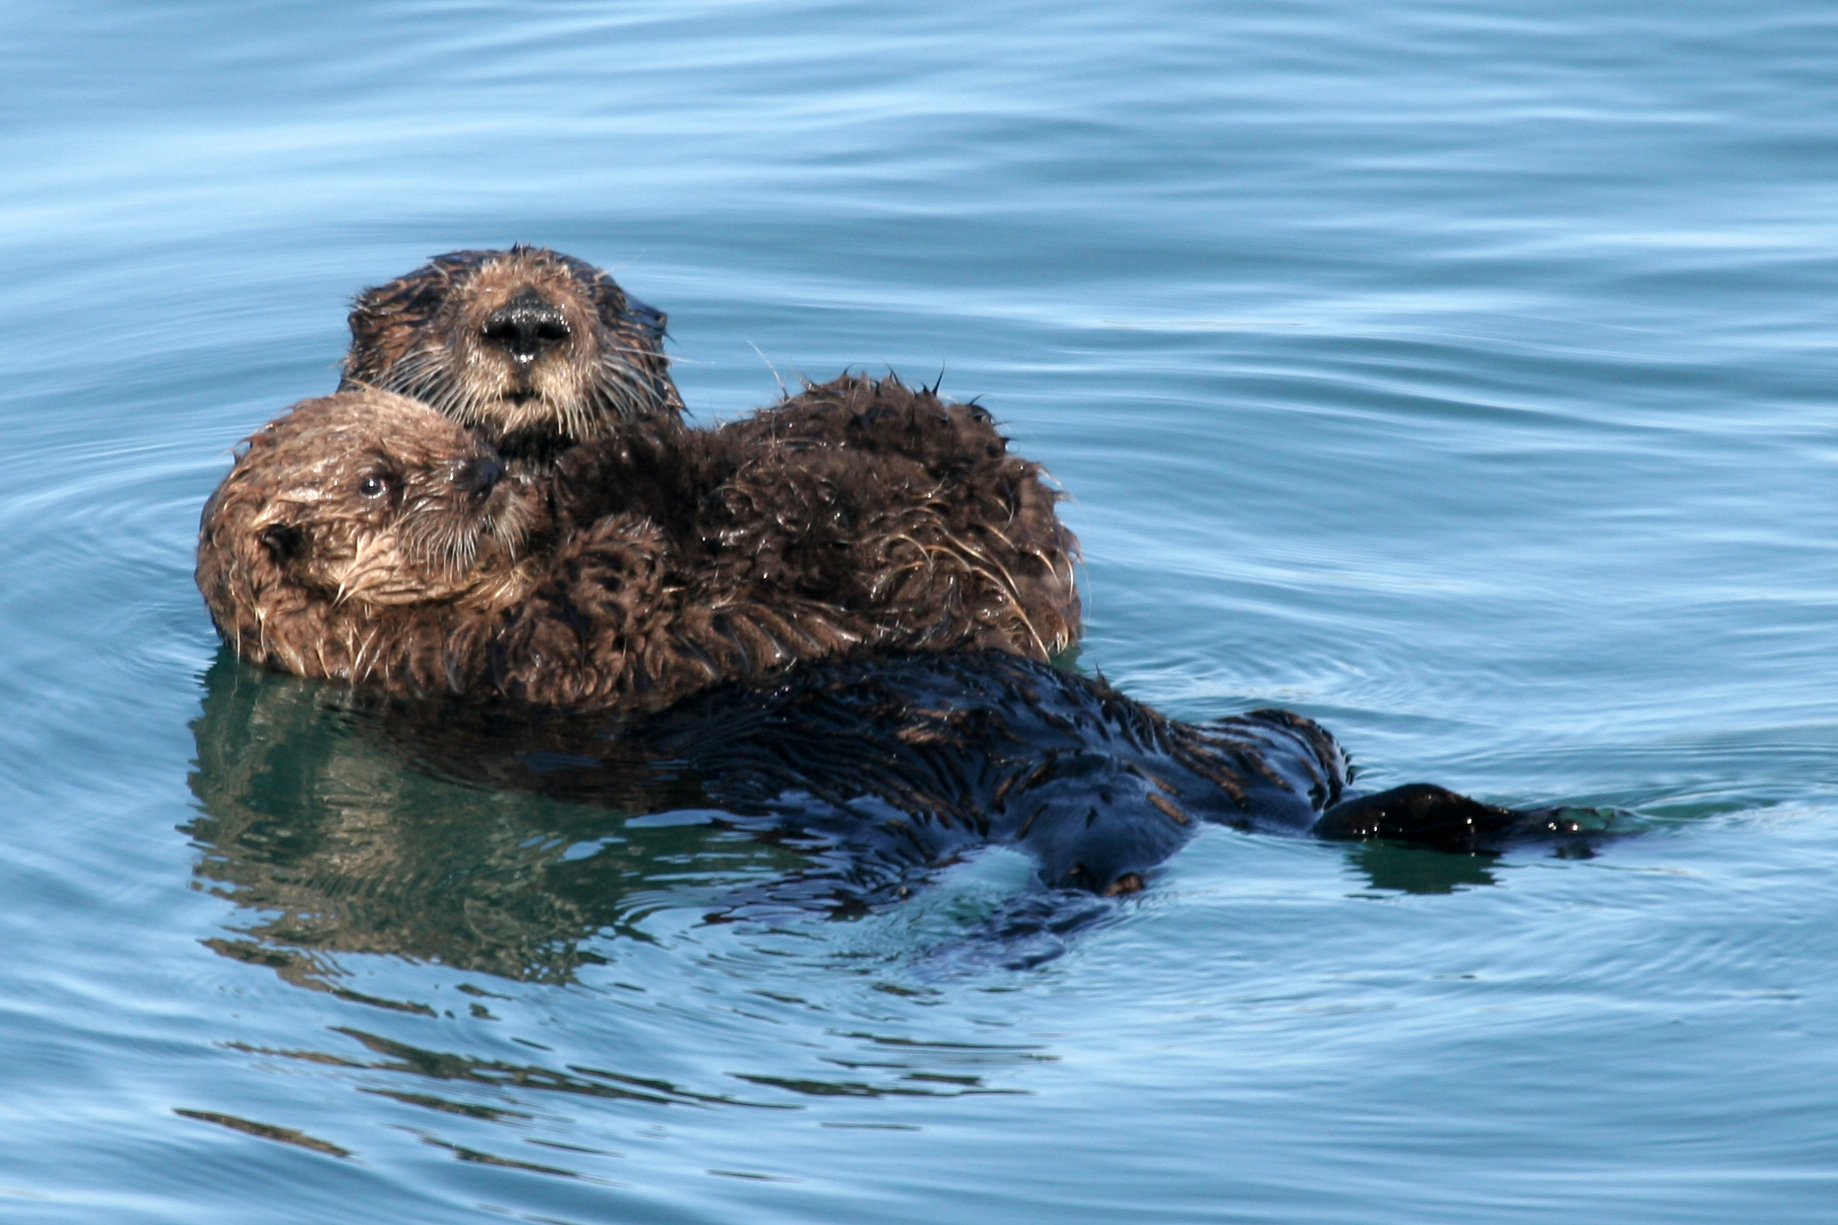 sea otter picture wallpaper sea otter picture download this wallpaper 1838x1225